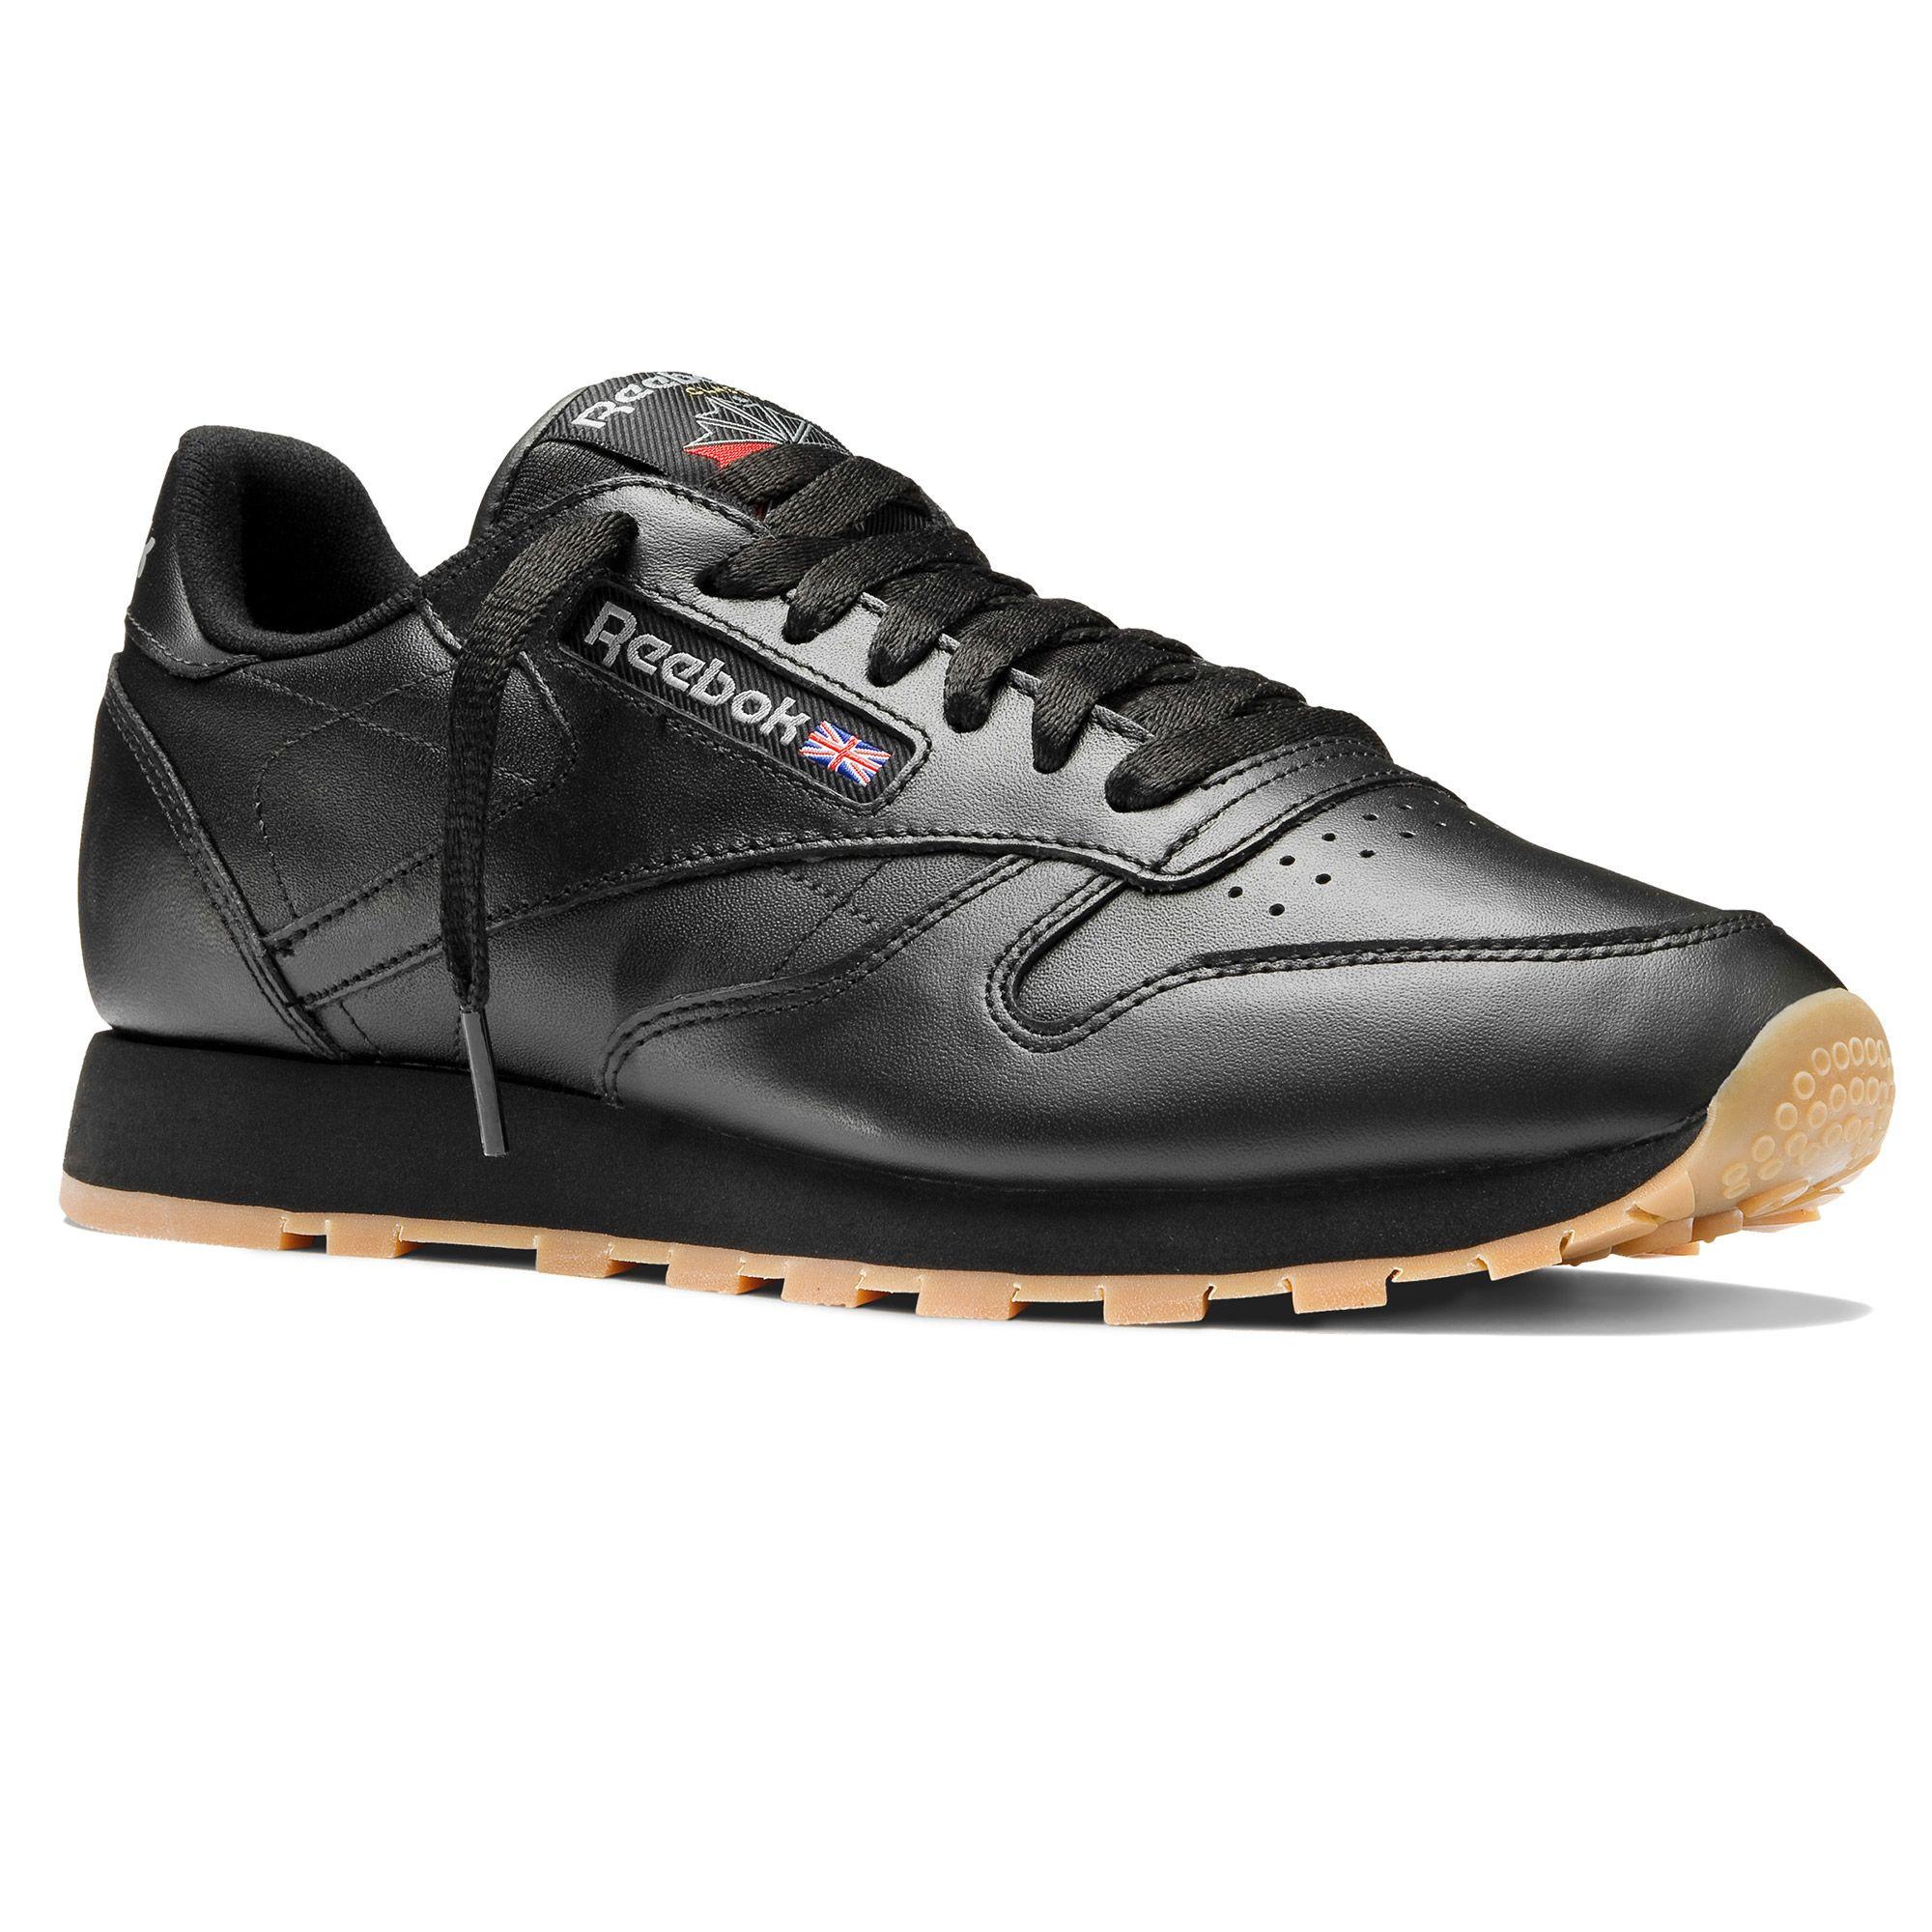 Reebok Classic Leather Männer - Intense Black/Gum (49800)